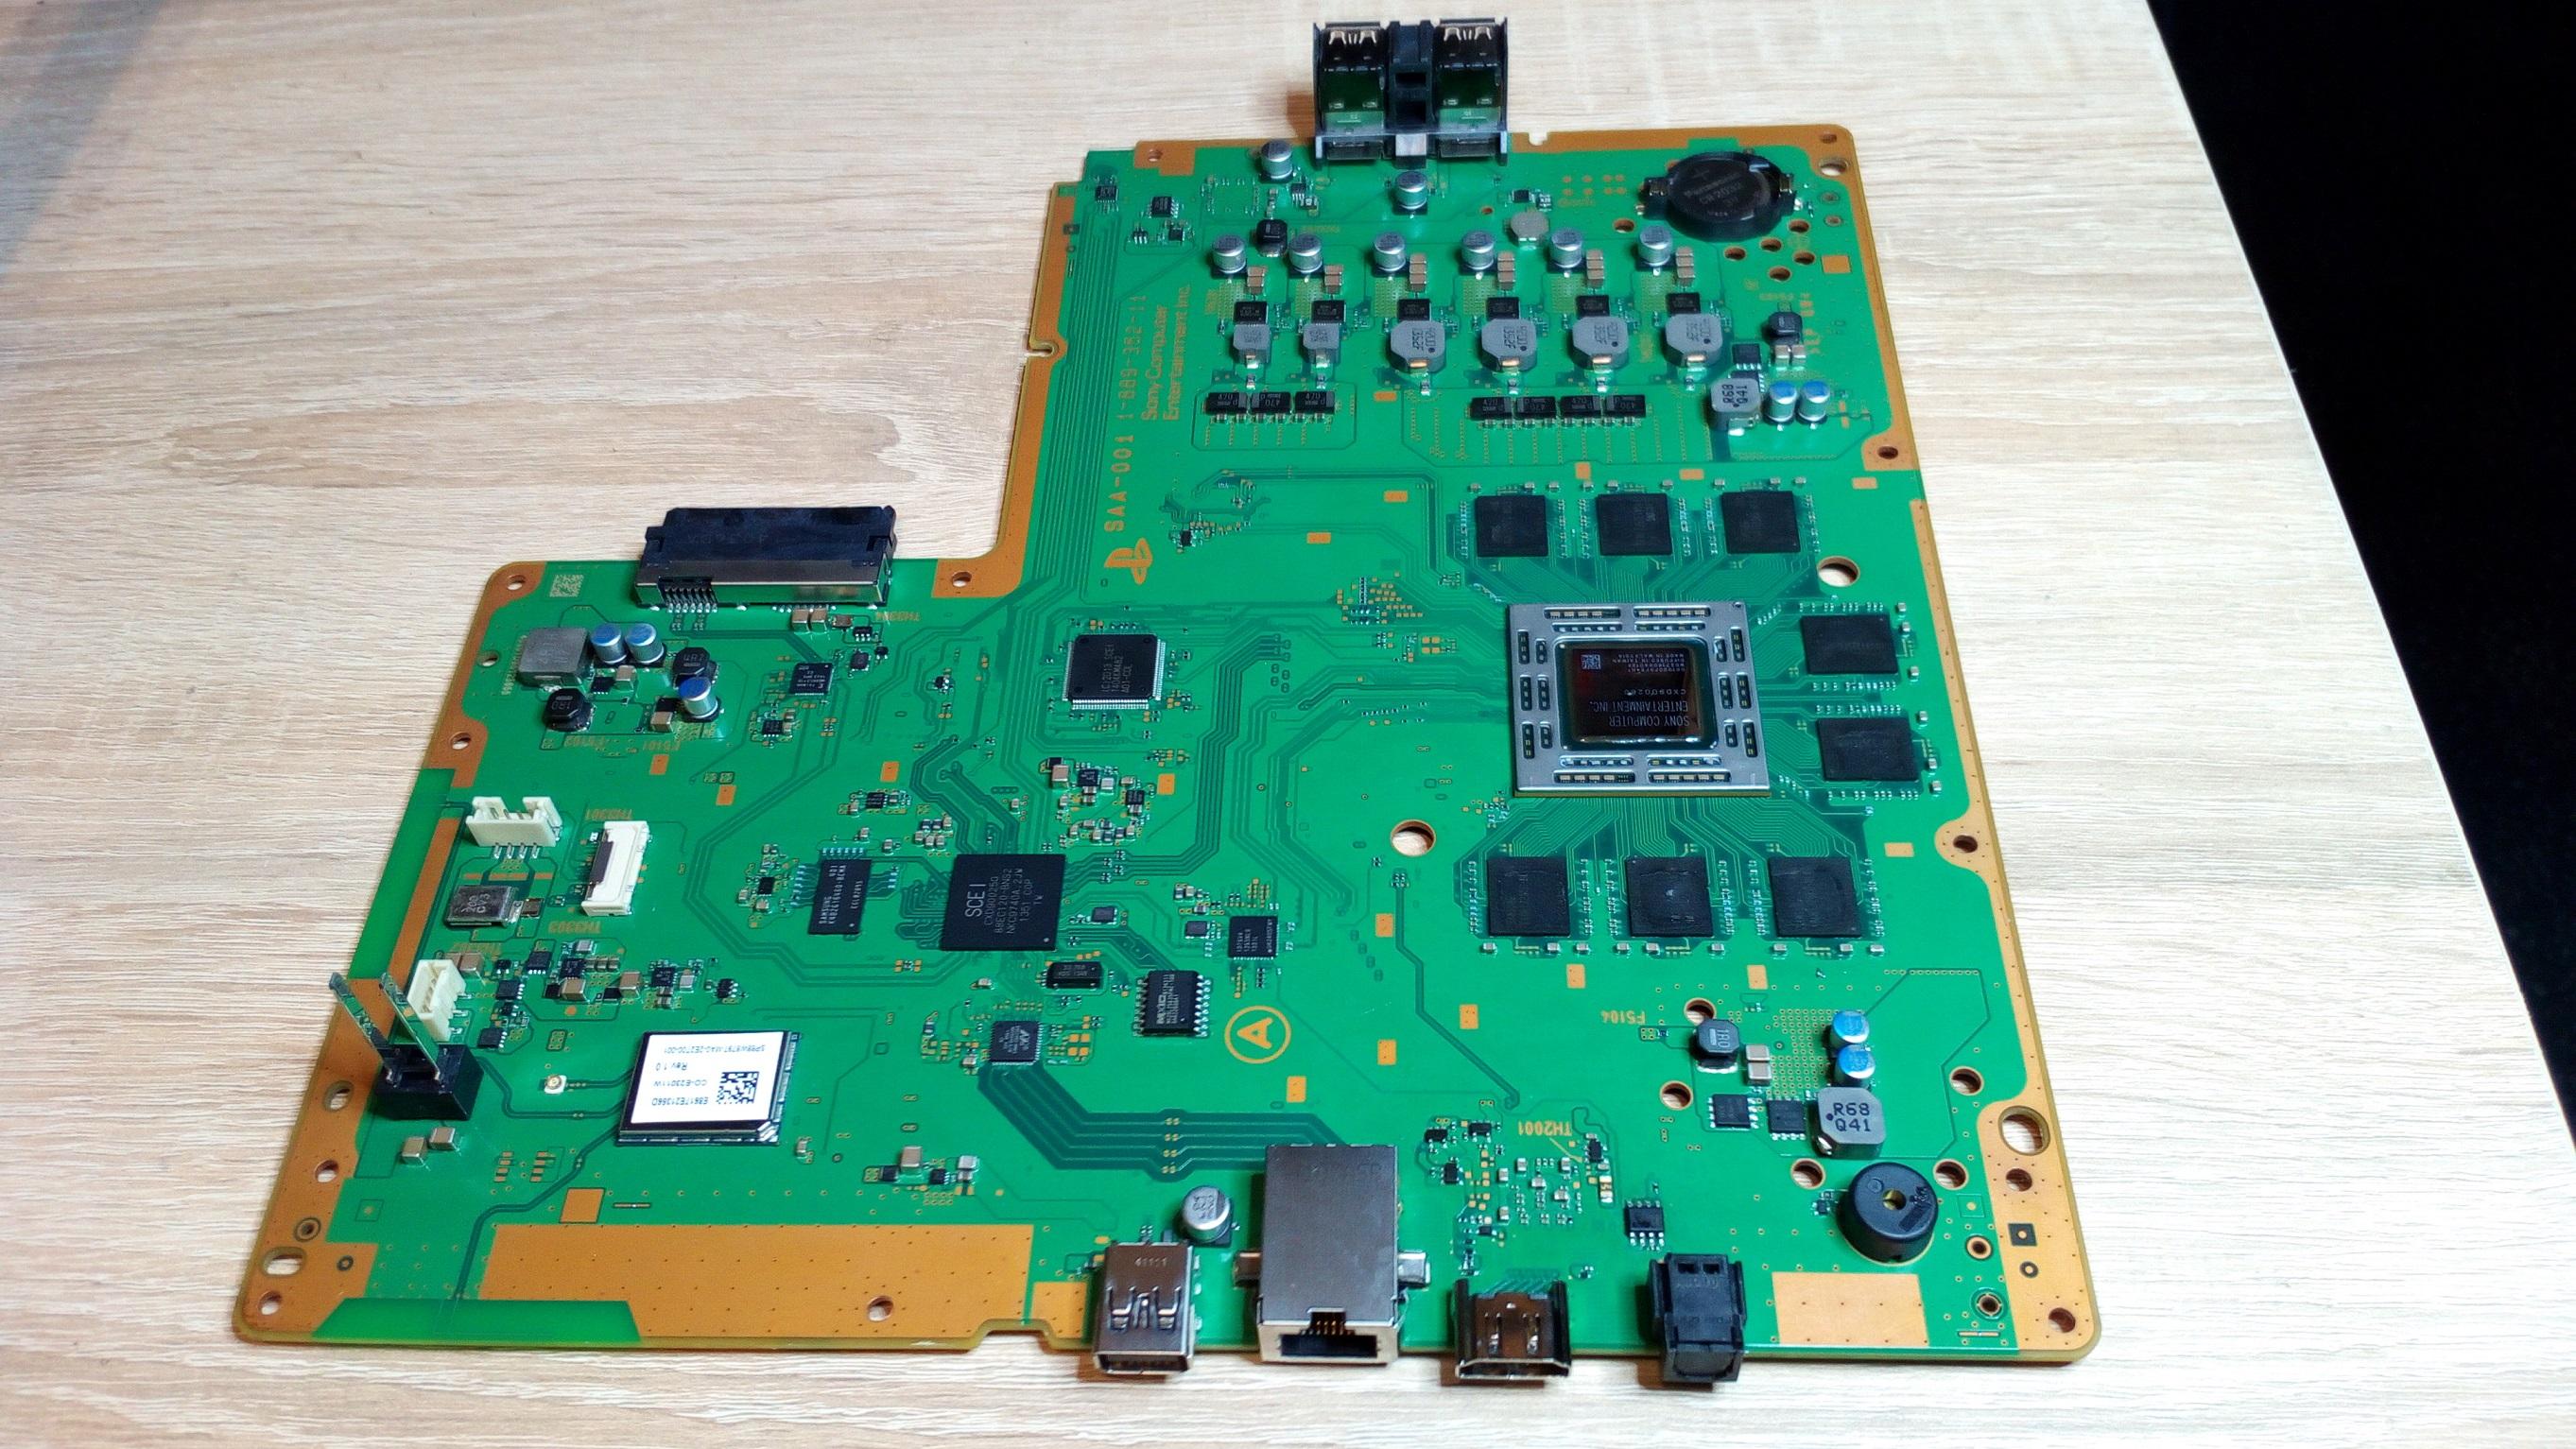 PS4 Blod (Blue Light of Death) Reparatur 32,00€